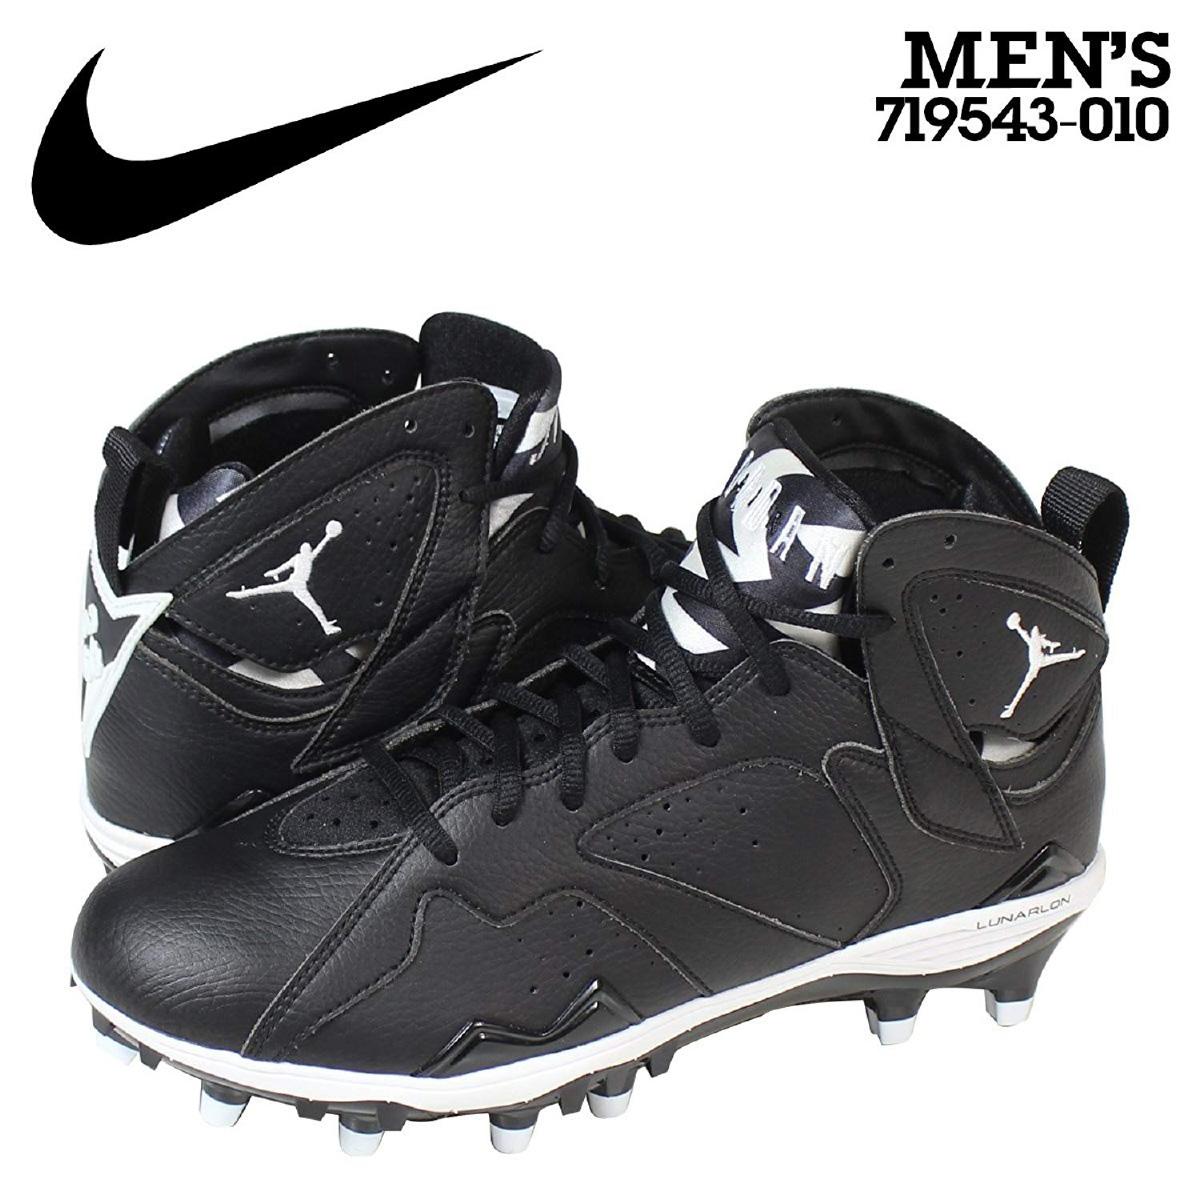 c319e54db948 ... football cleats shoes mens 11 45 ebay 644f3 80d87  denmark nike air  jordan 7 retro td nike air jordan 7 nostalgic spikes men 719543 010